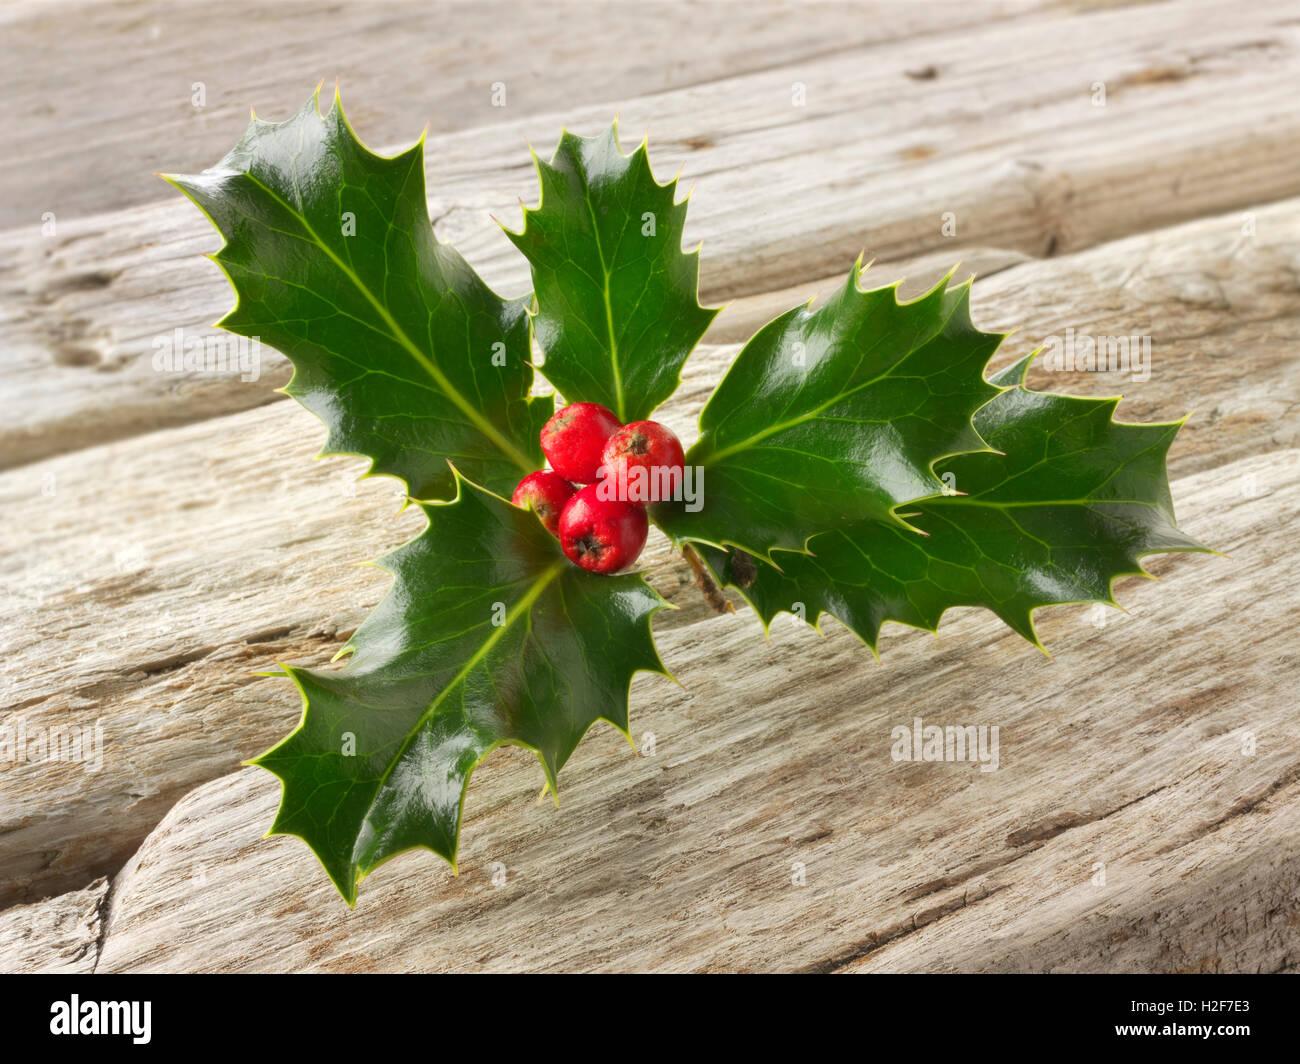 Festive seasonal Holly leaves with red berries - Ilex aquifolium - Stock Image